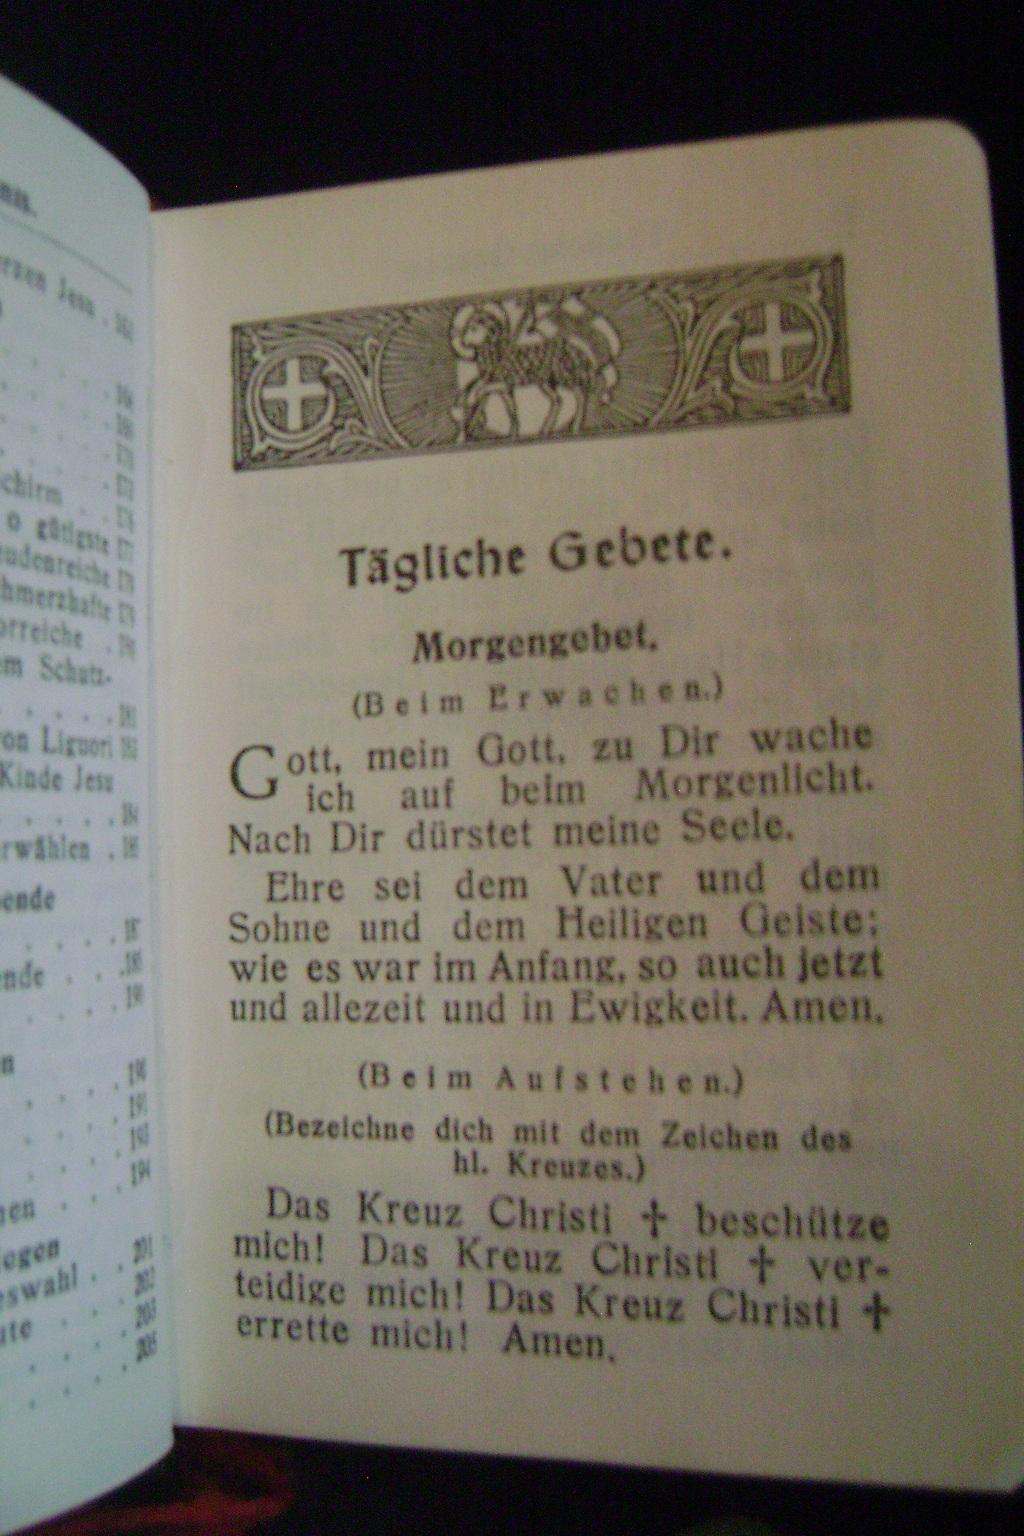 Knjiga_religija_Fuhrer_zum_himmel_1956__3.JPG